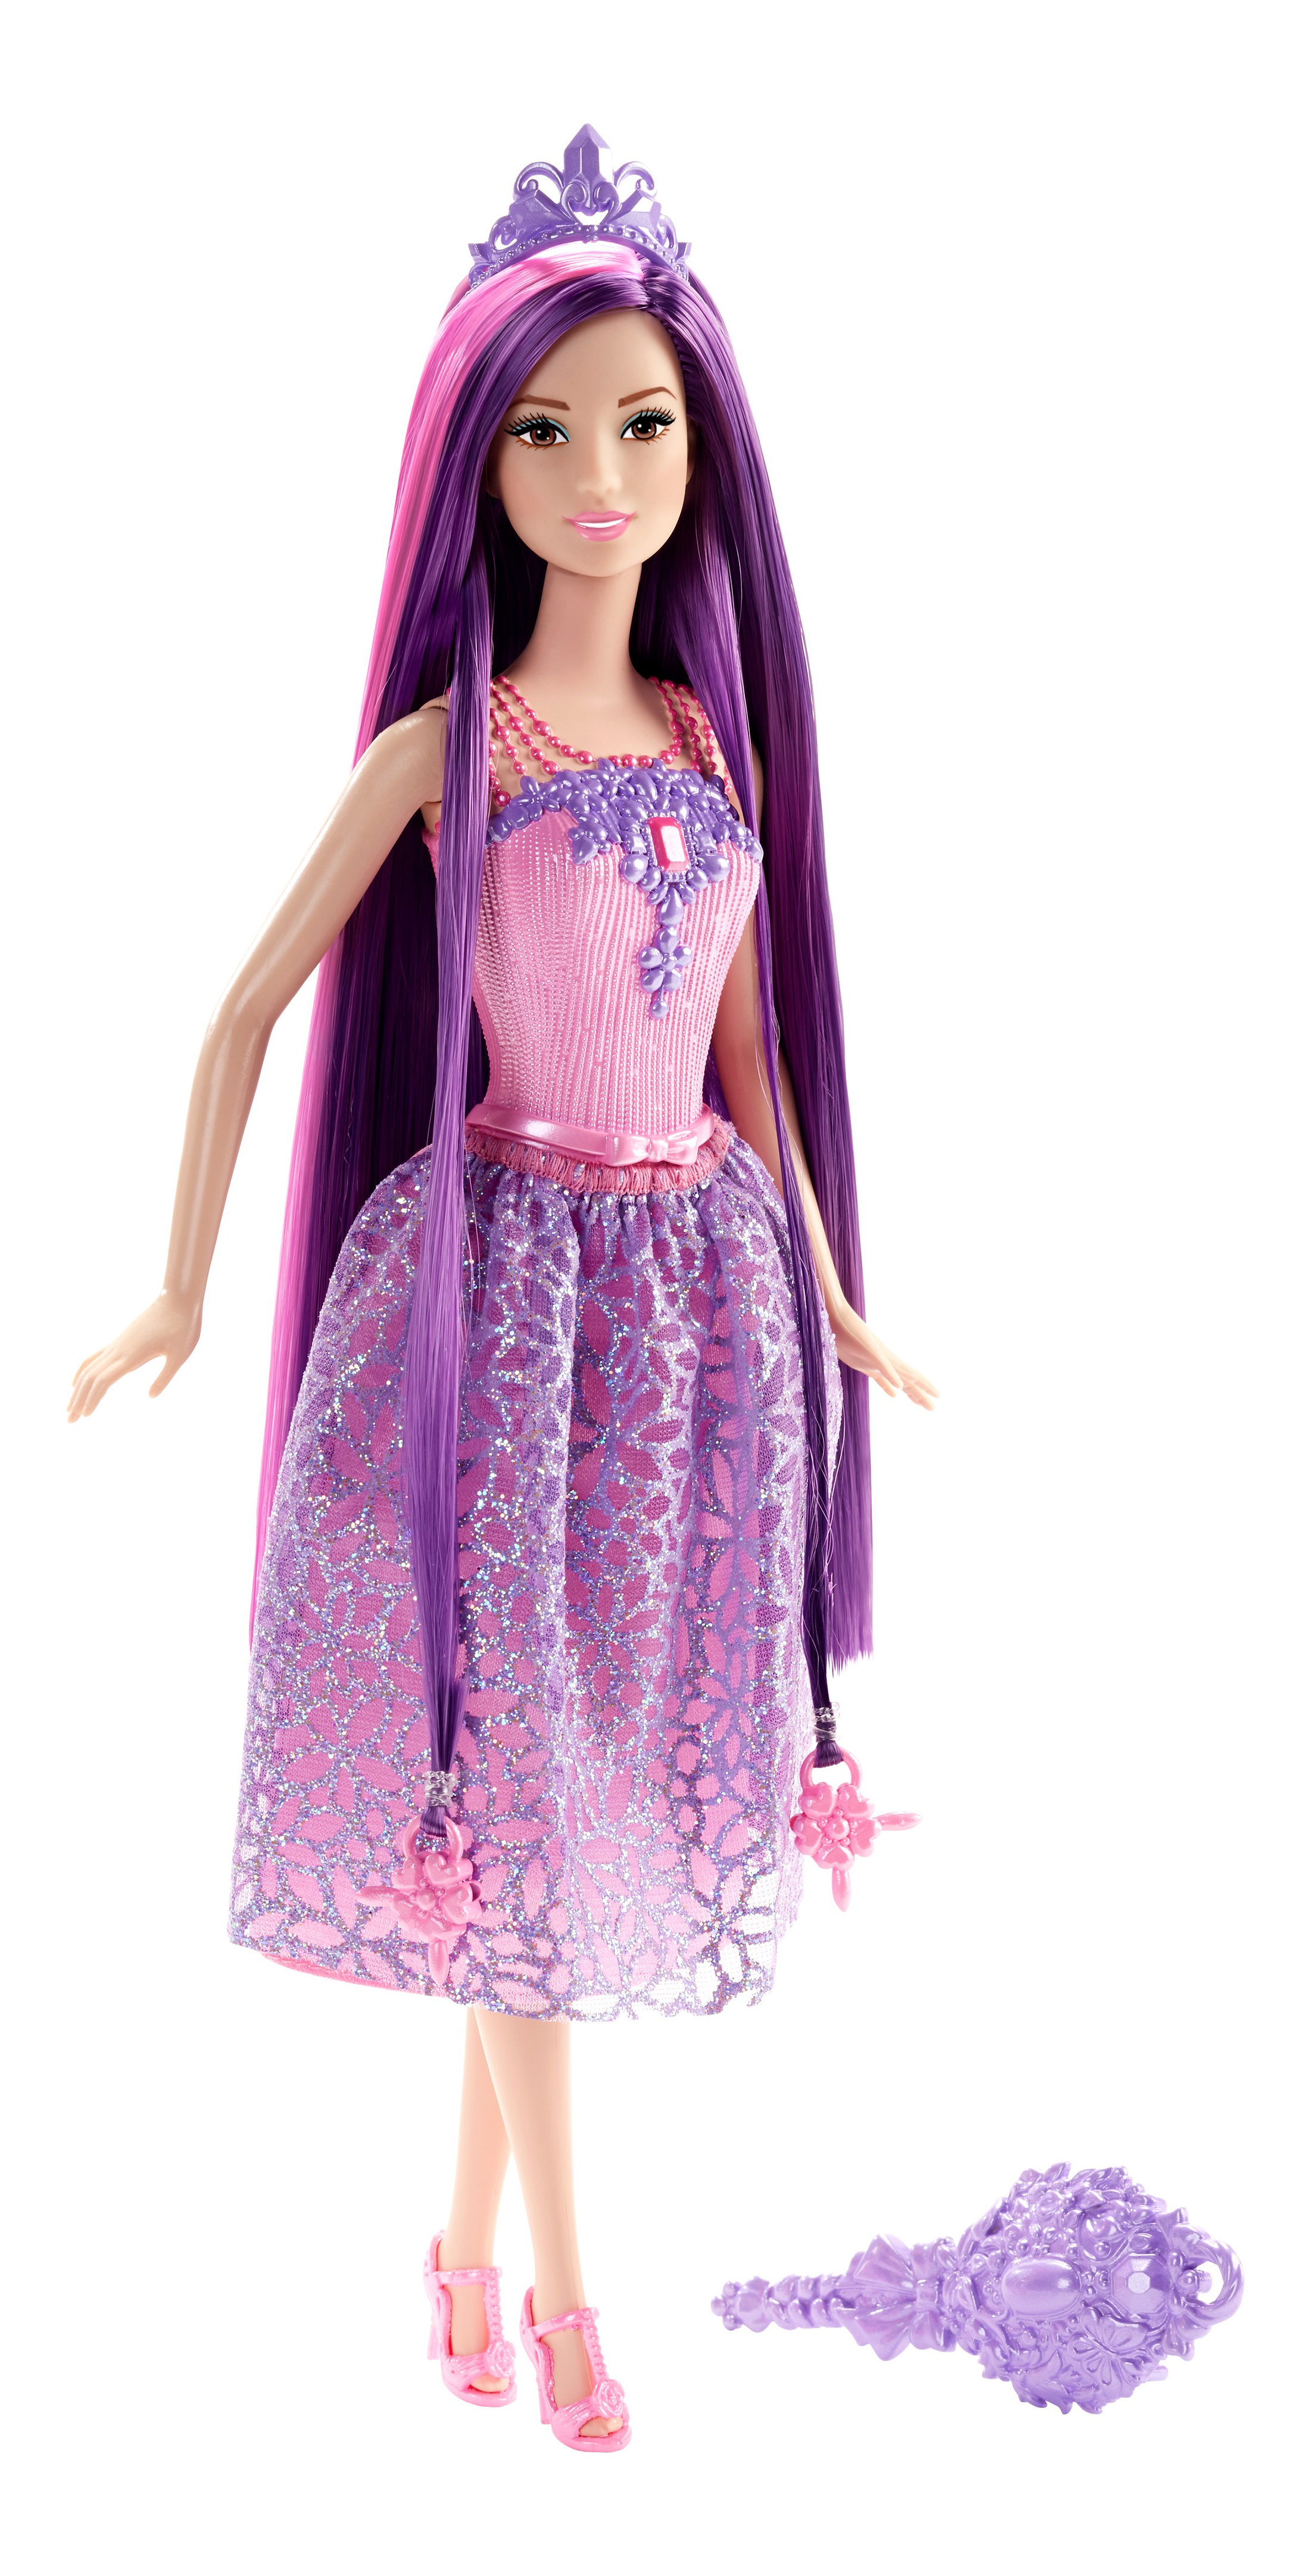 Купить Endless Hair Kingdom Princess Doll - Purple Hair, Кукла-принцесса Barbie с длинными волосами DKB56 DKB59, Куклы Barbie